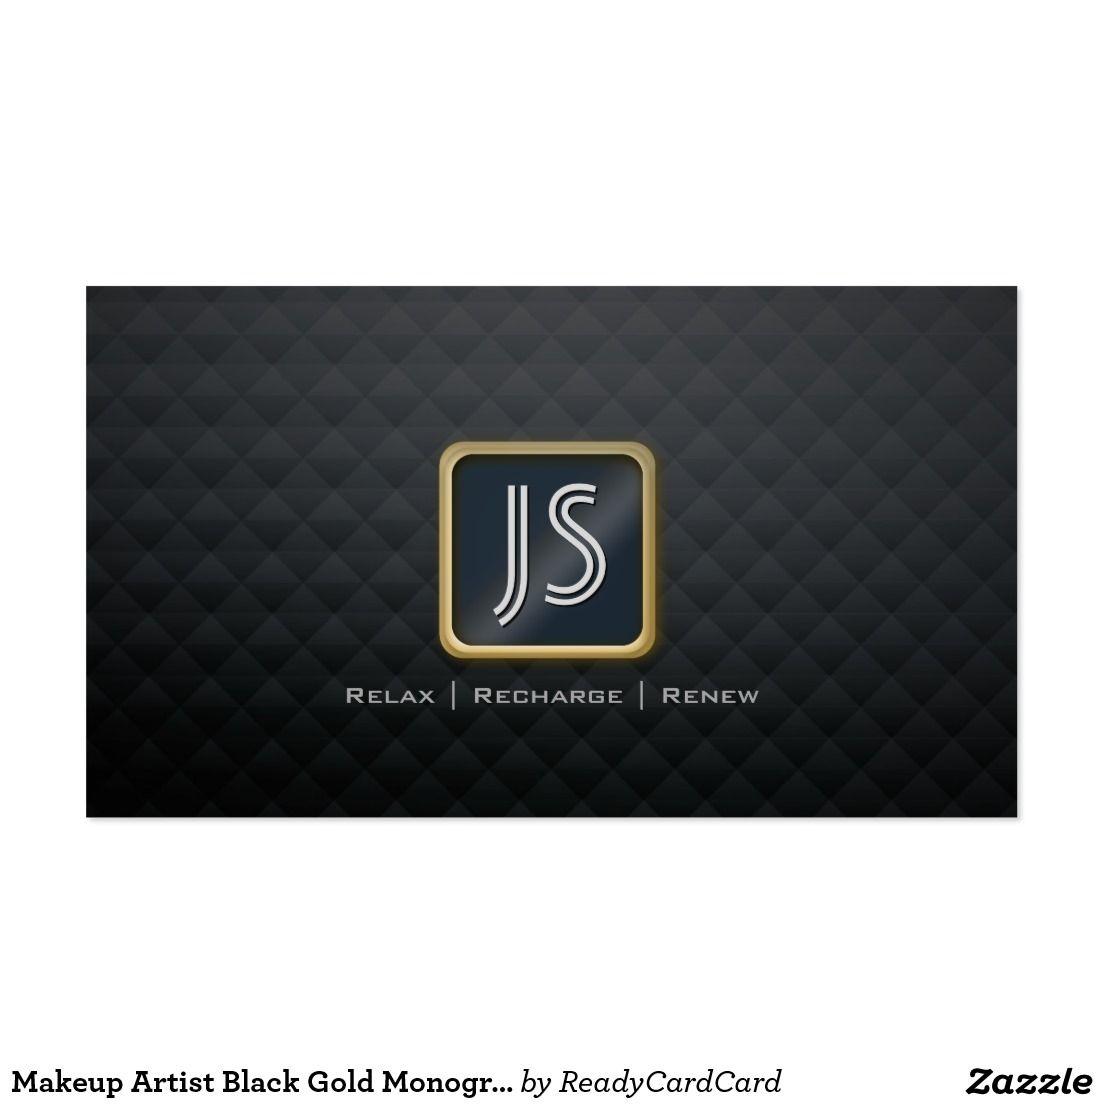 Makeup artist black gold monogram diamond pattern business card makeup artist black gold monogram diamond pattern business card magicingreecefo Choice Image